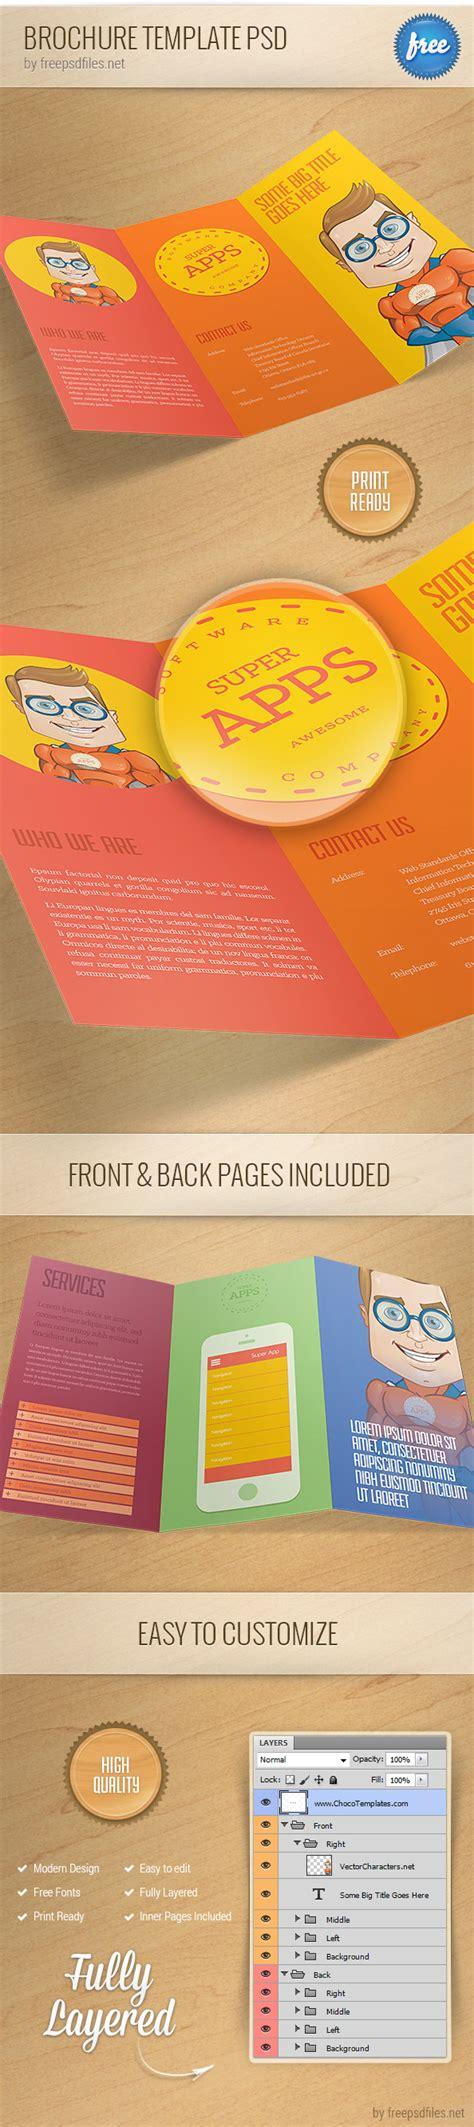 Brochure Template Psd 1 Free Psd Files Brochure Template Psd File Free